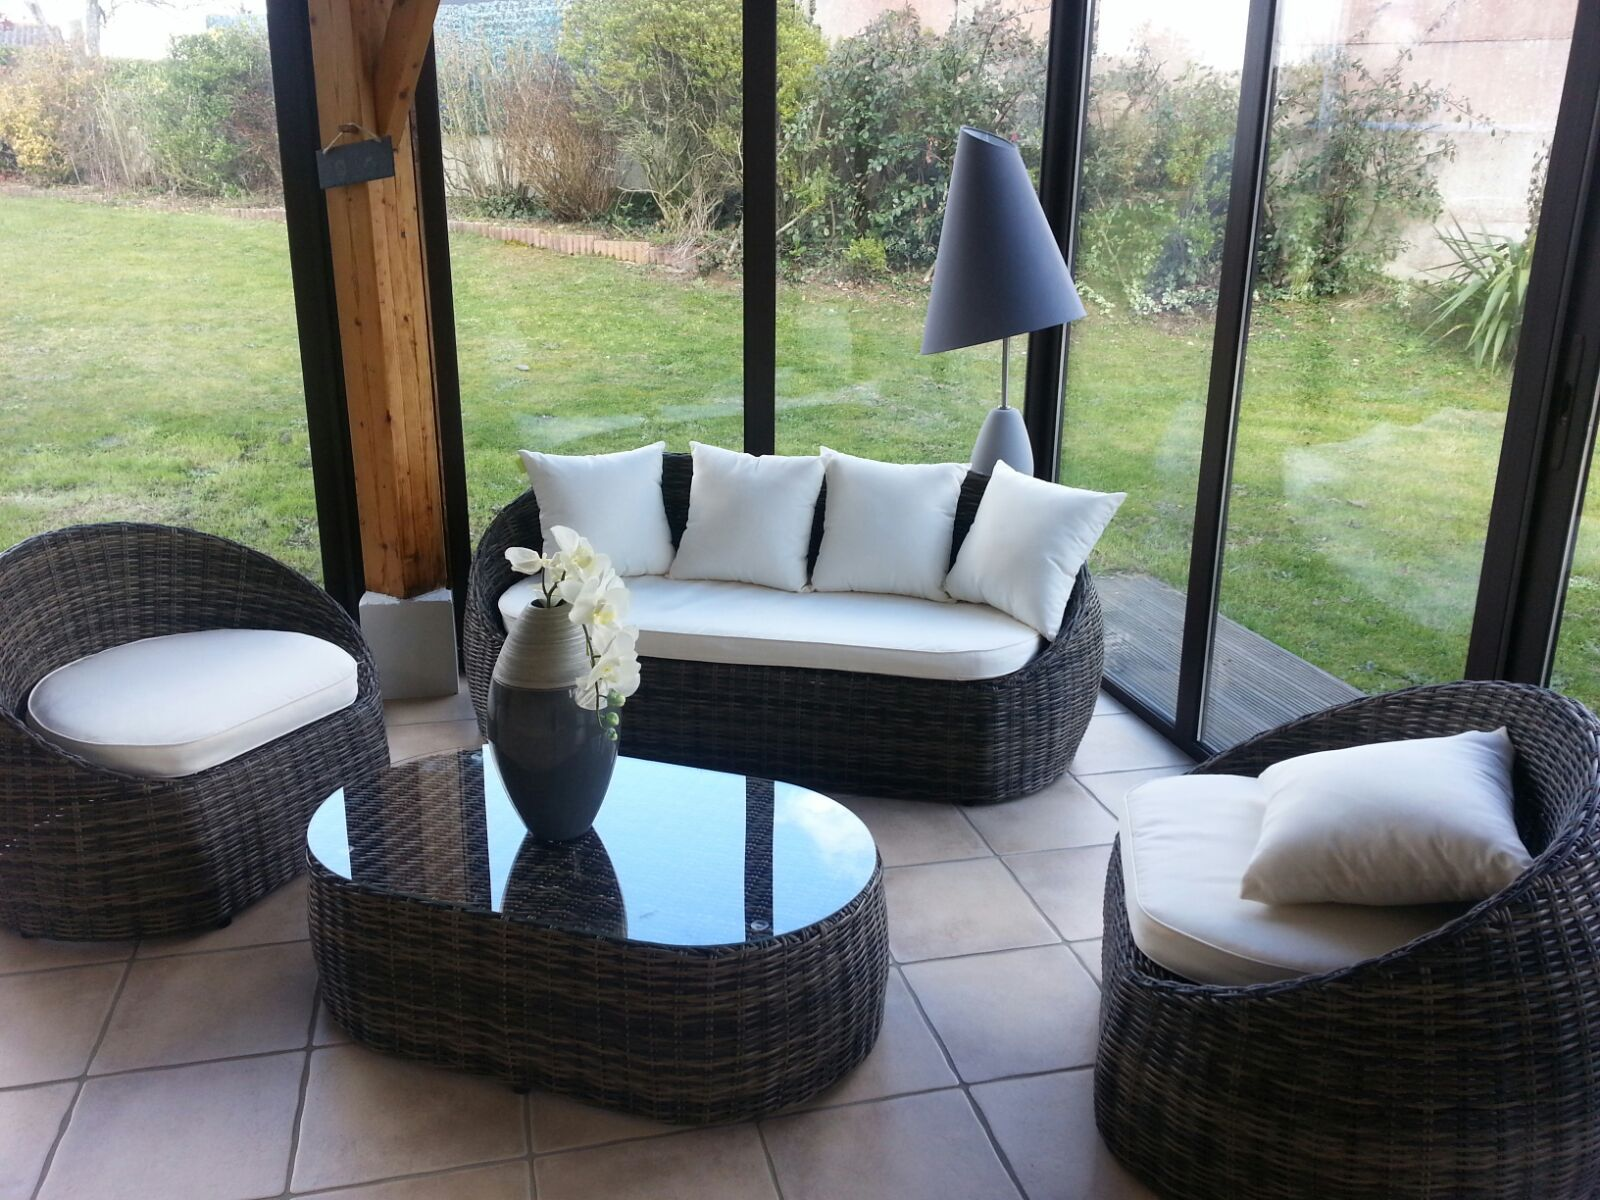 Ritardo salon de jardin 4 places en résine tressée déco jardin